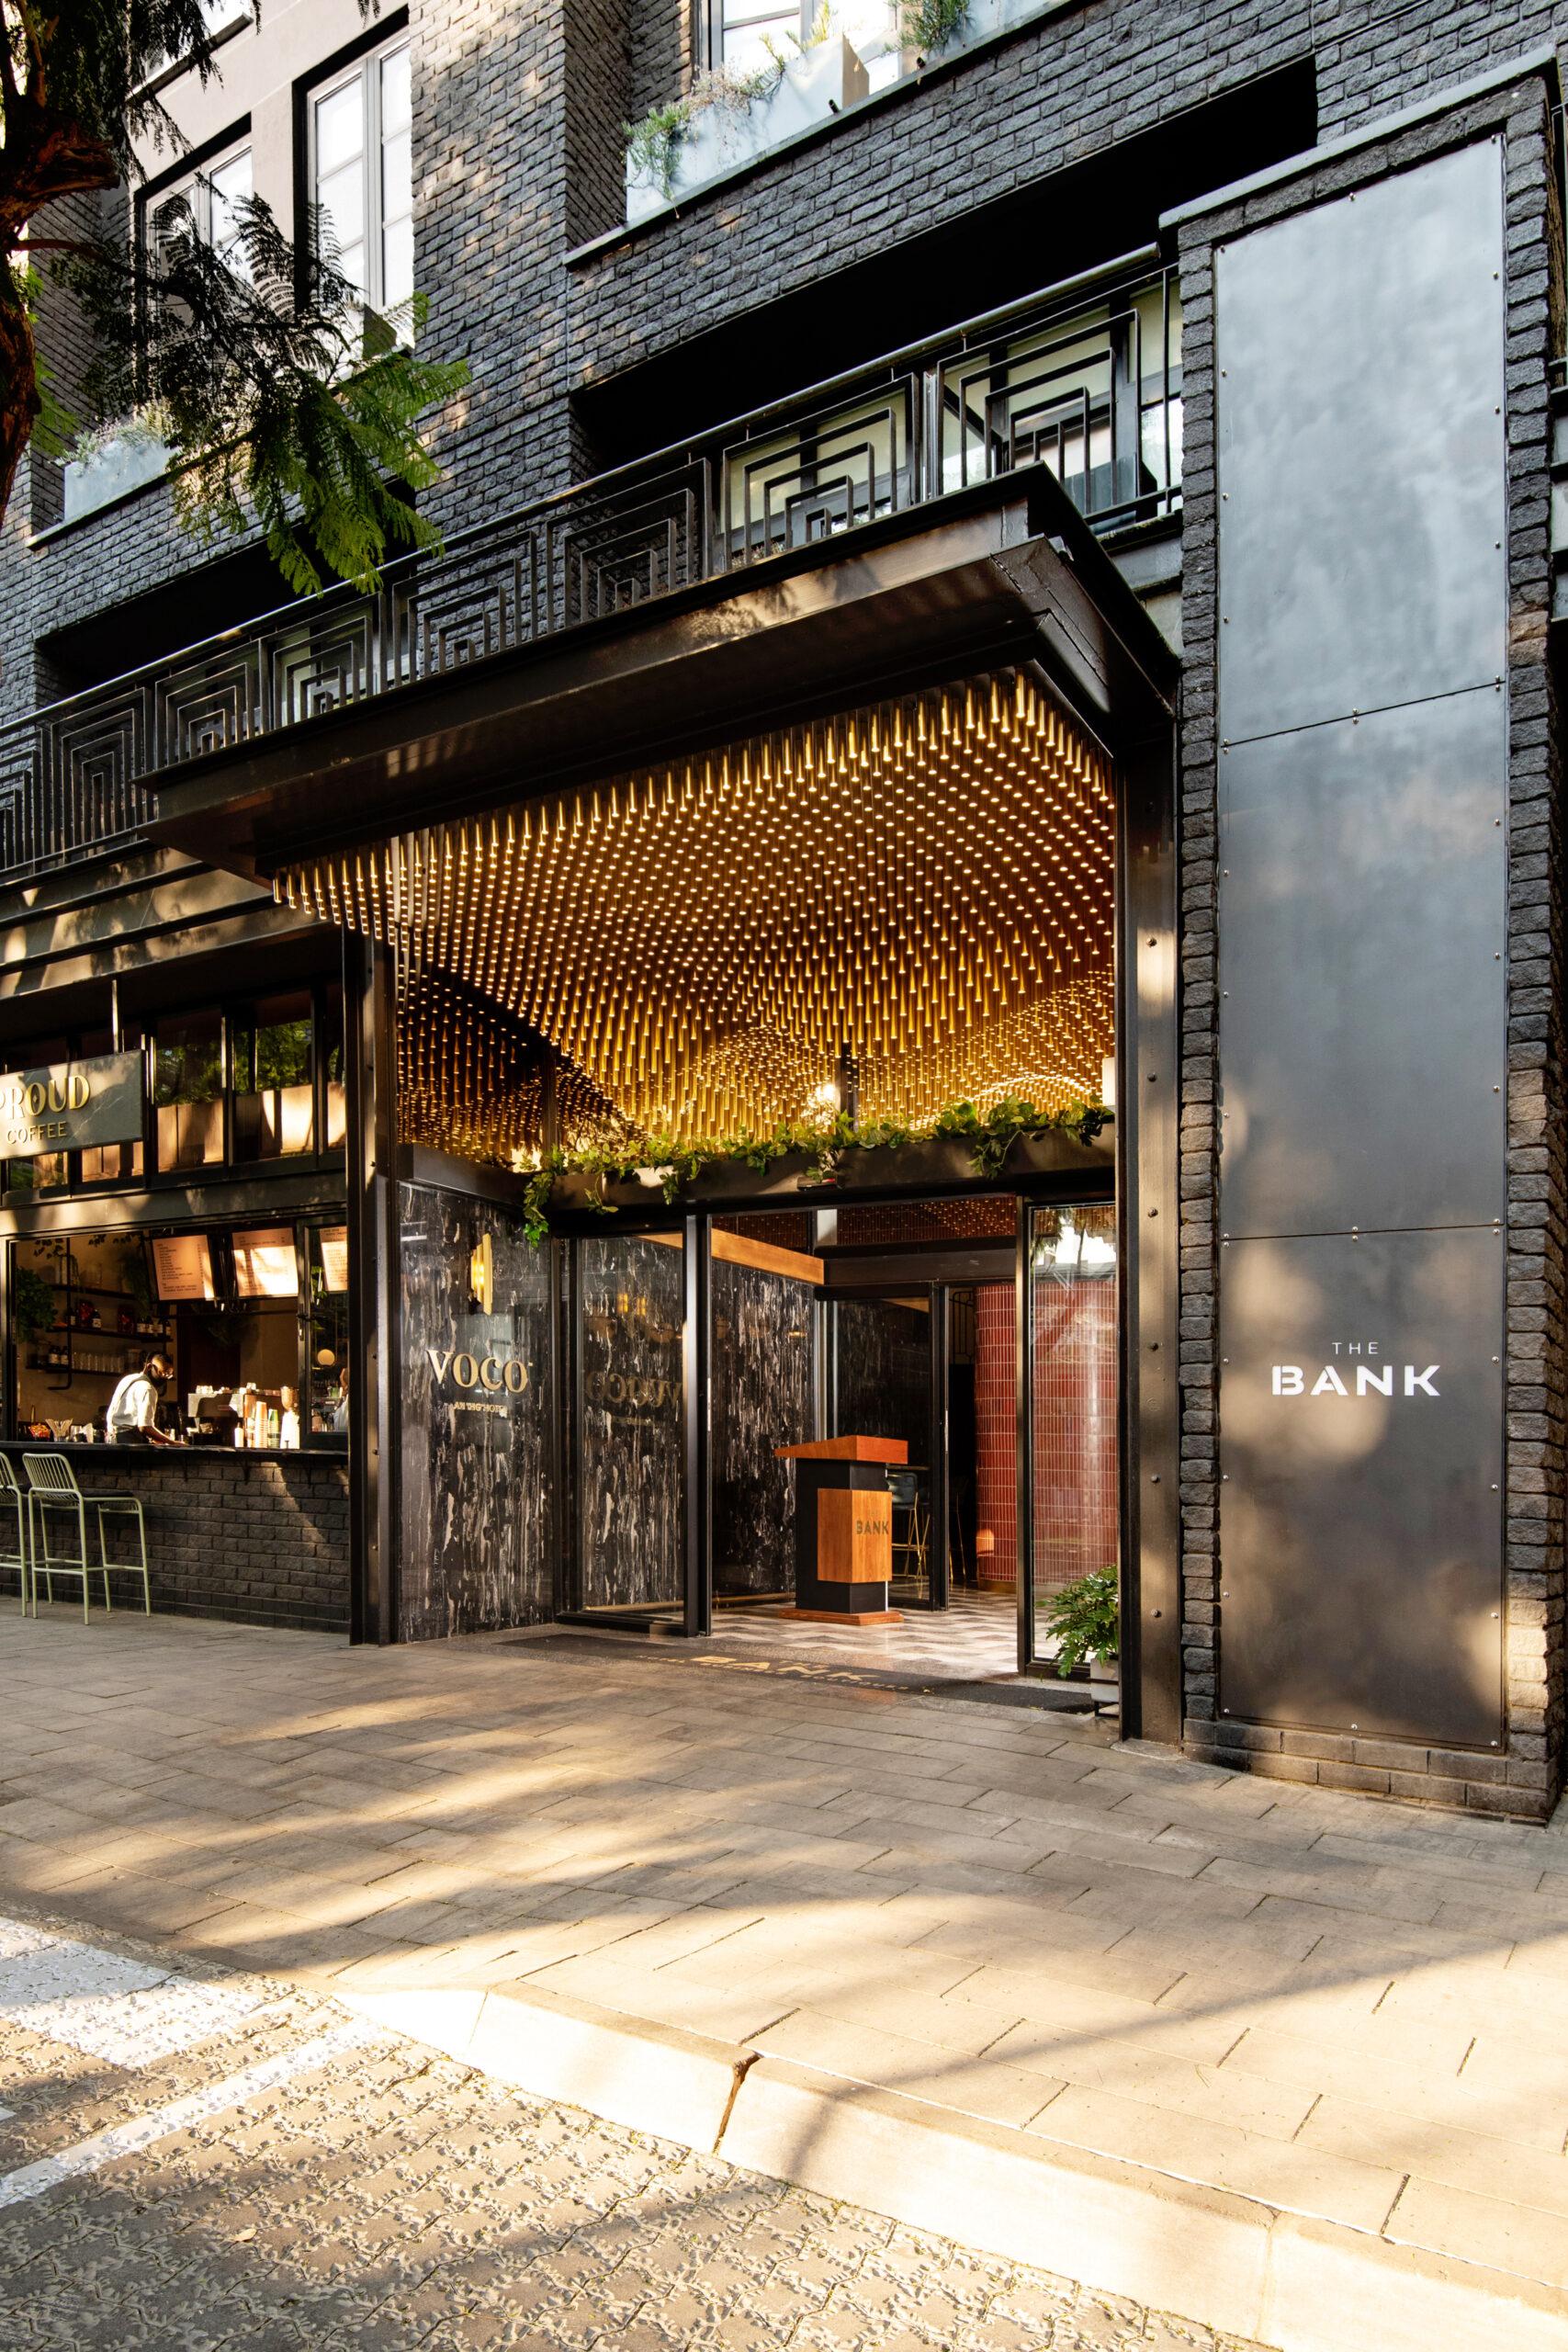 imbewu-design-the-bank-hotel-exterior-3